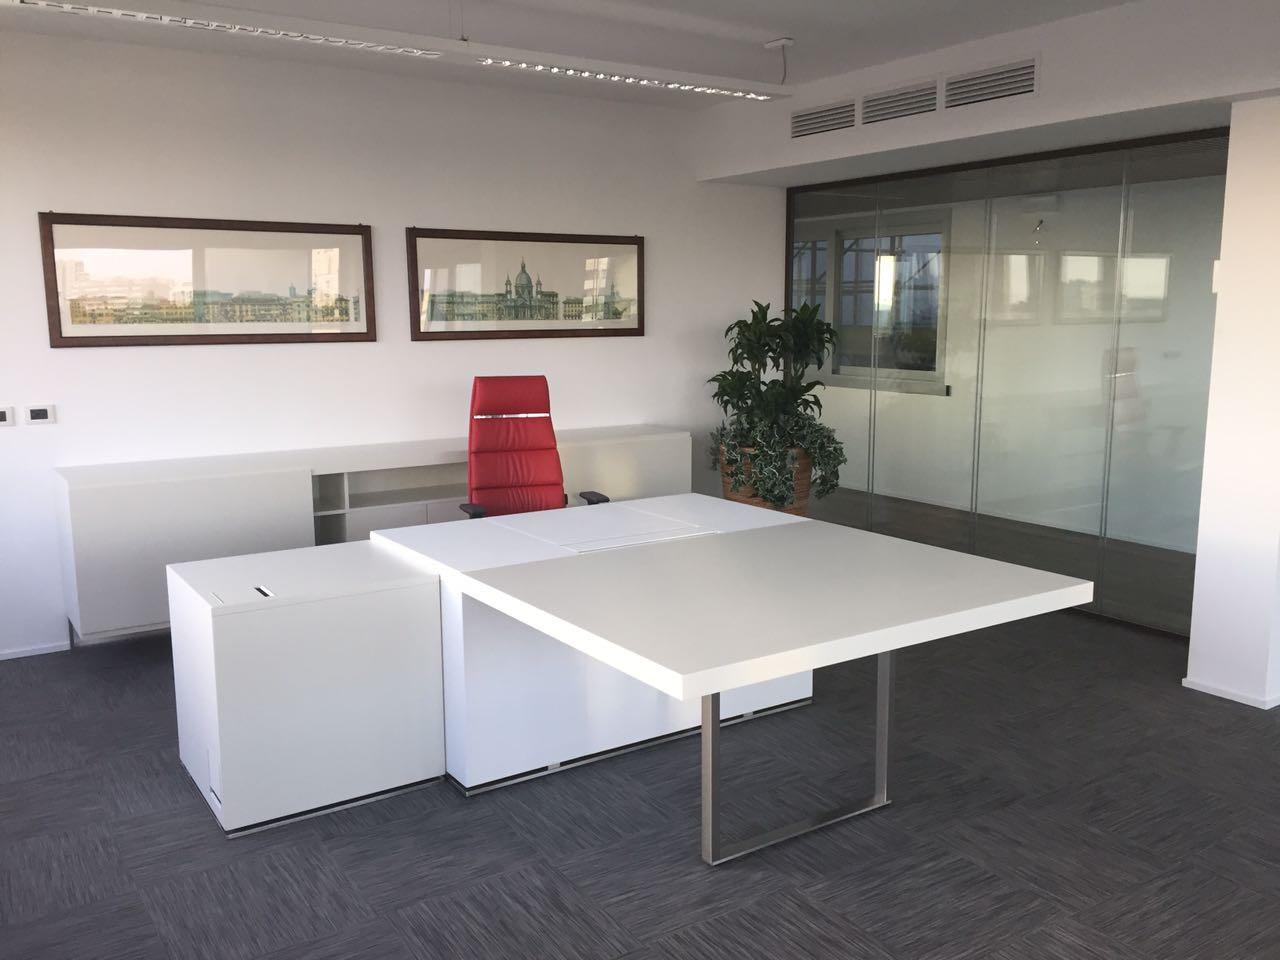 Mobili Per Ufficio Roma : Pareti divisorie mobili per ufficio a roma takeda sistema ufficio